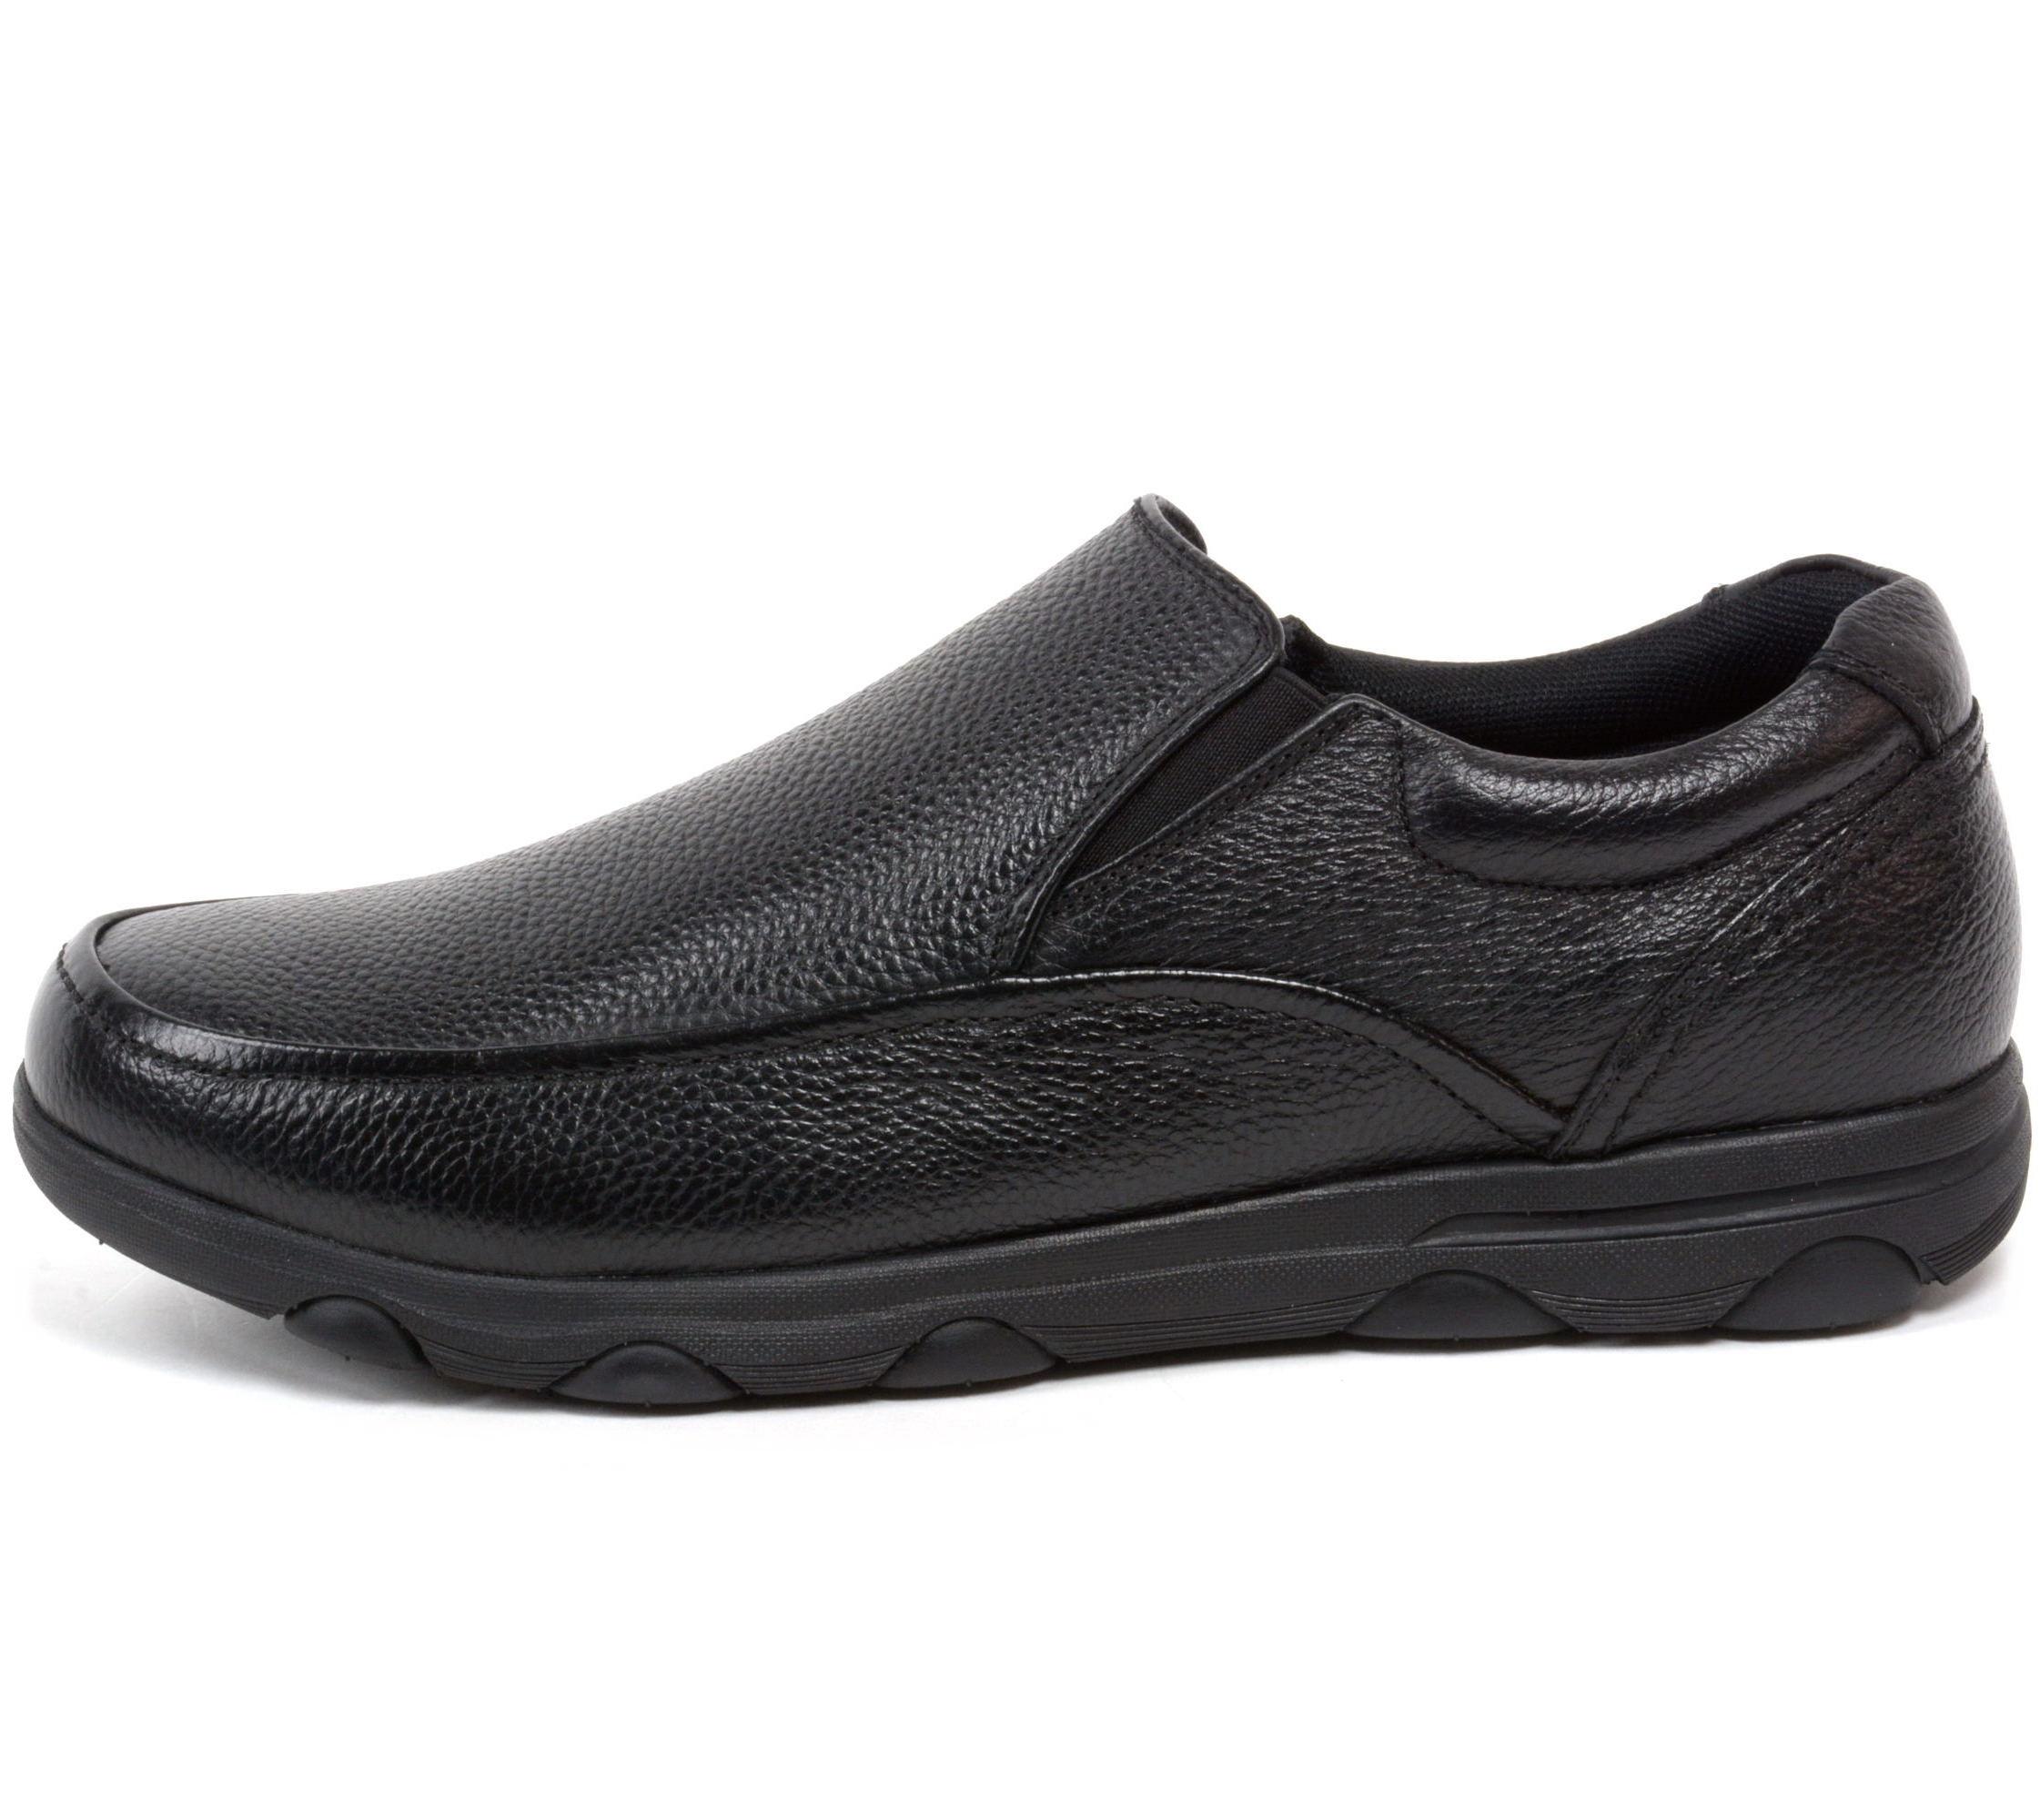 Black Slip Resistant Work Shoes